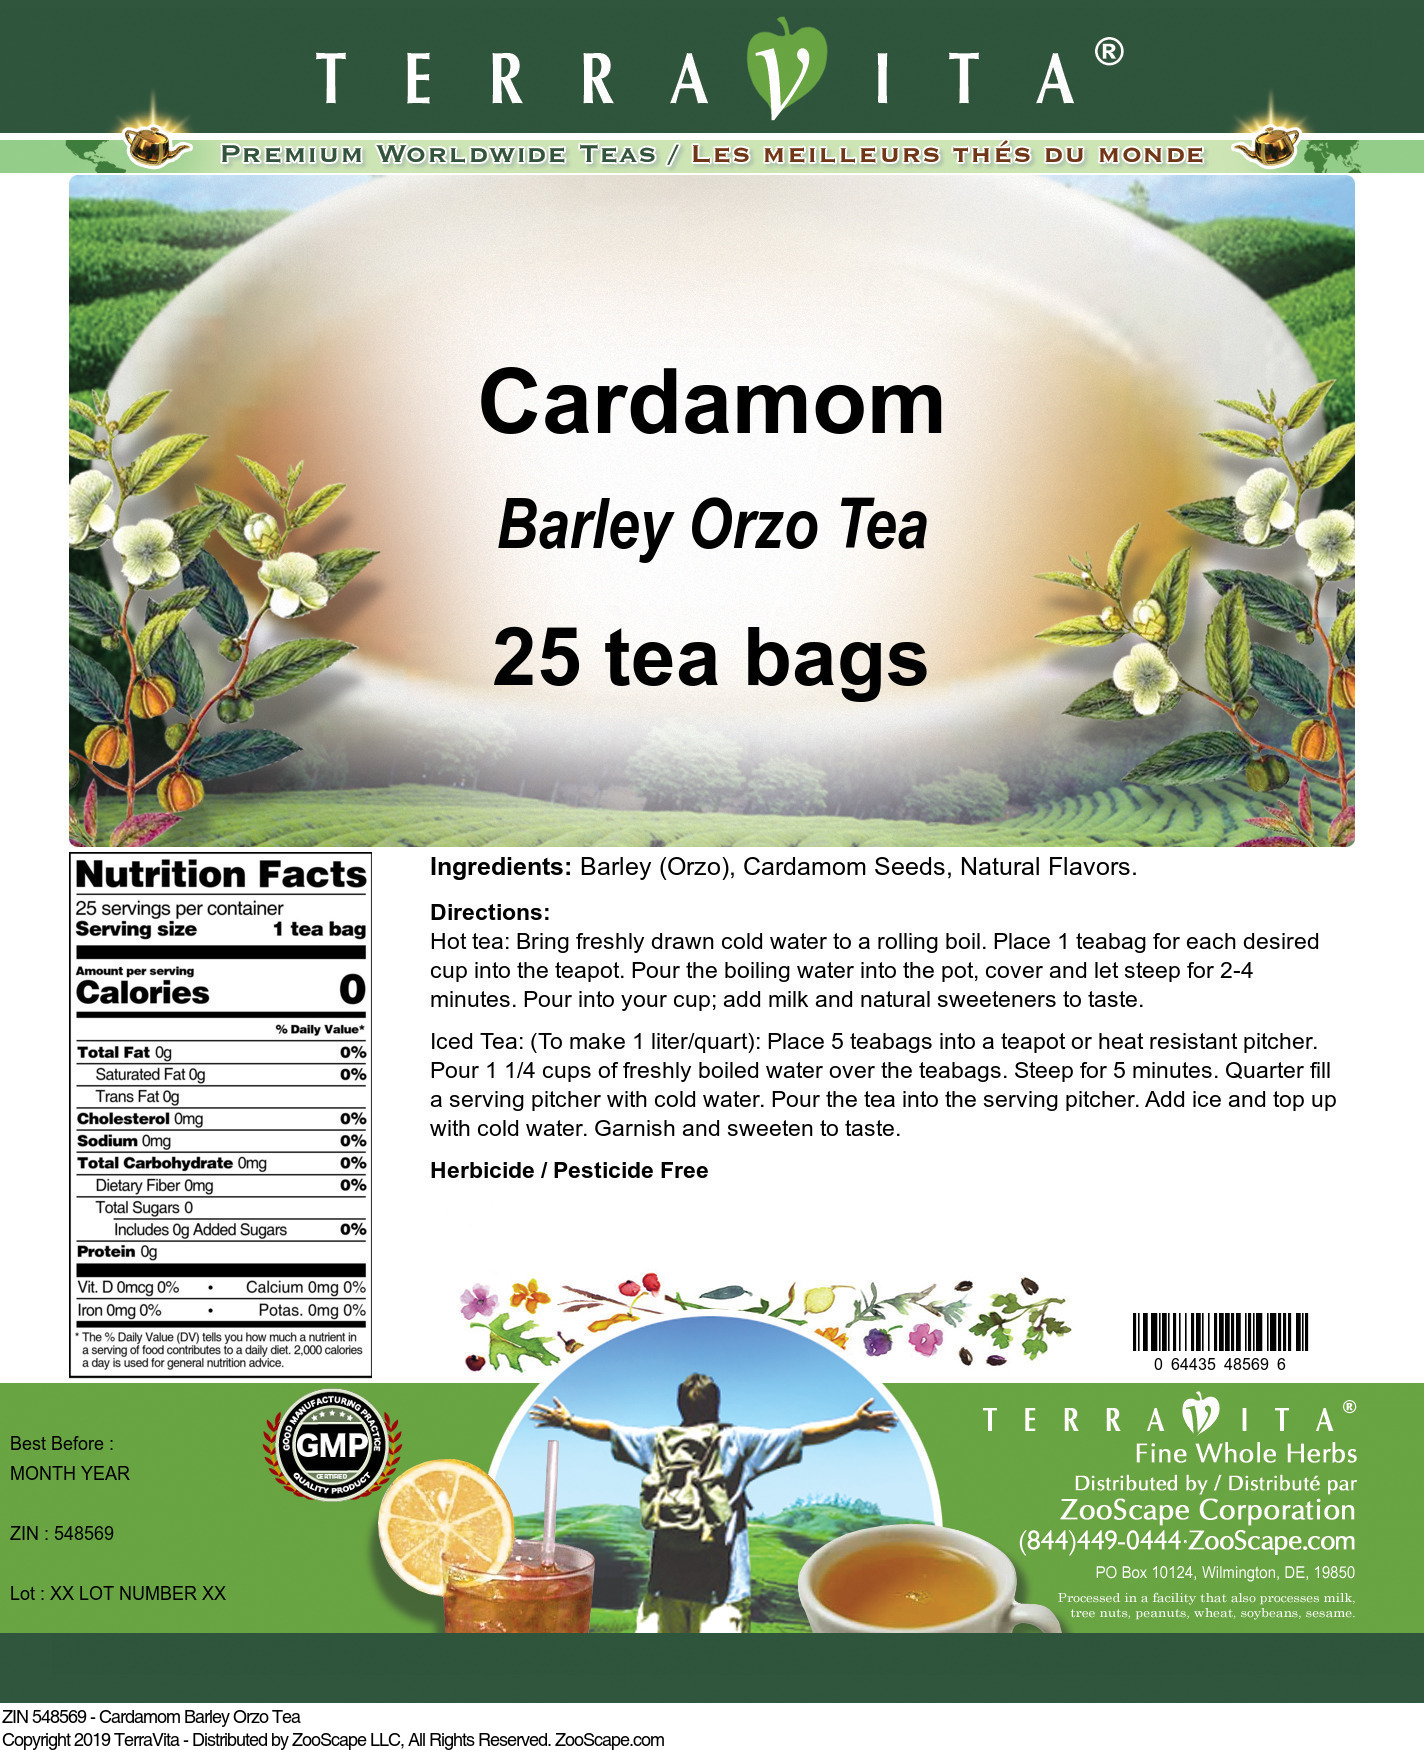 Cardamom Barley Orzo